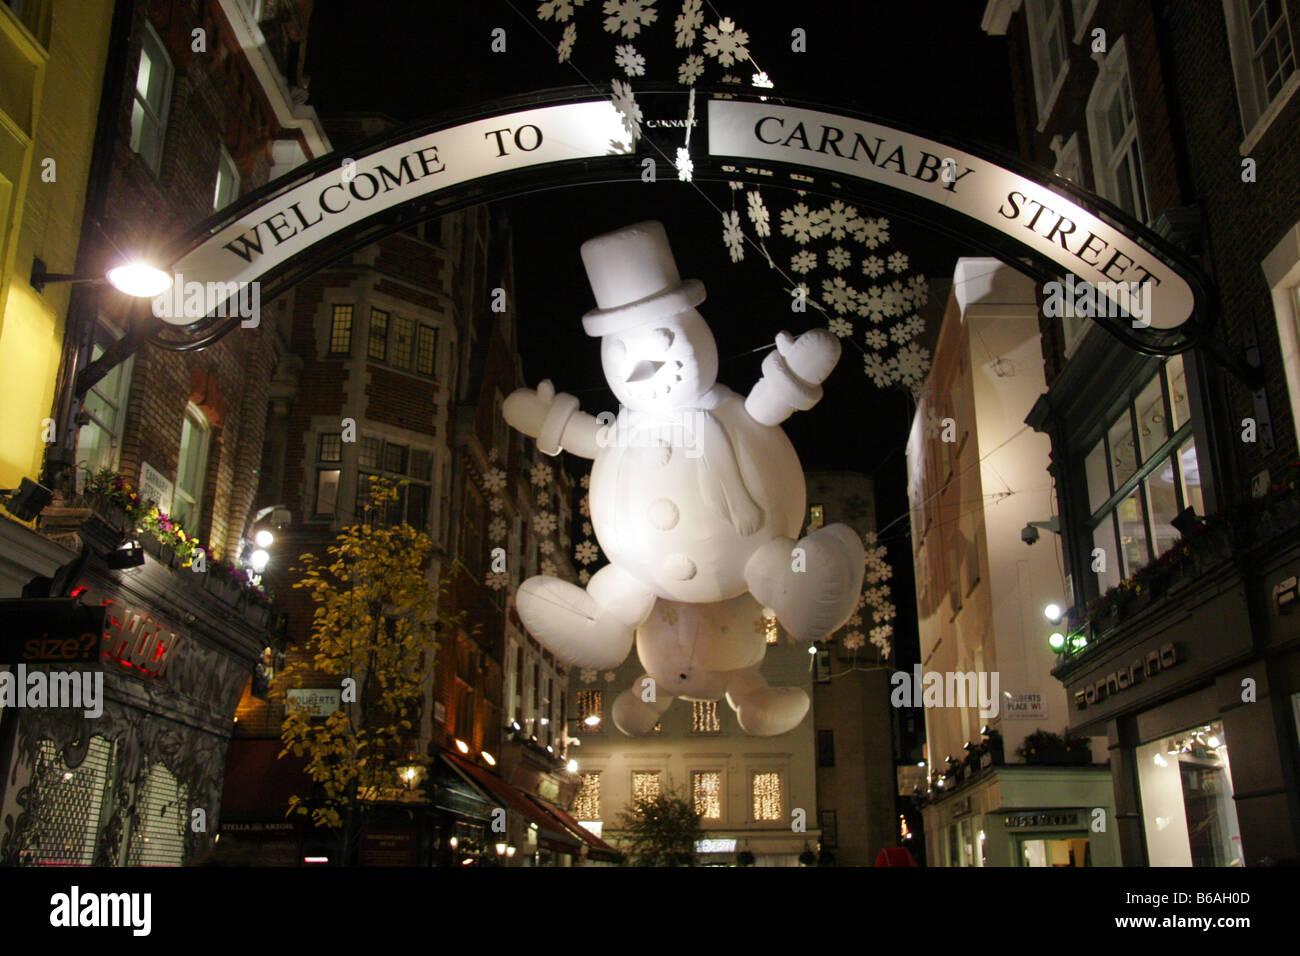 Christmas Snowmen Decorations.Giant Inflattable Snowmen Christmas Decorations In Carnaby